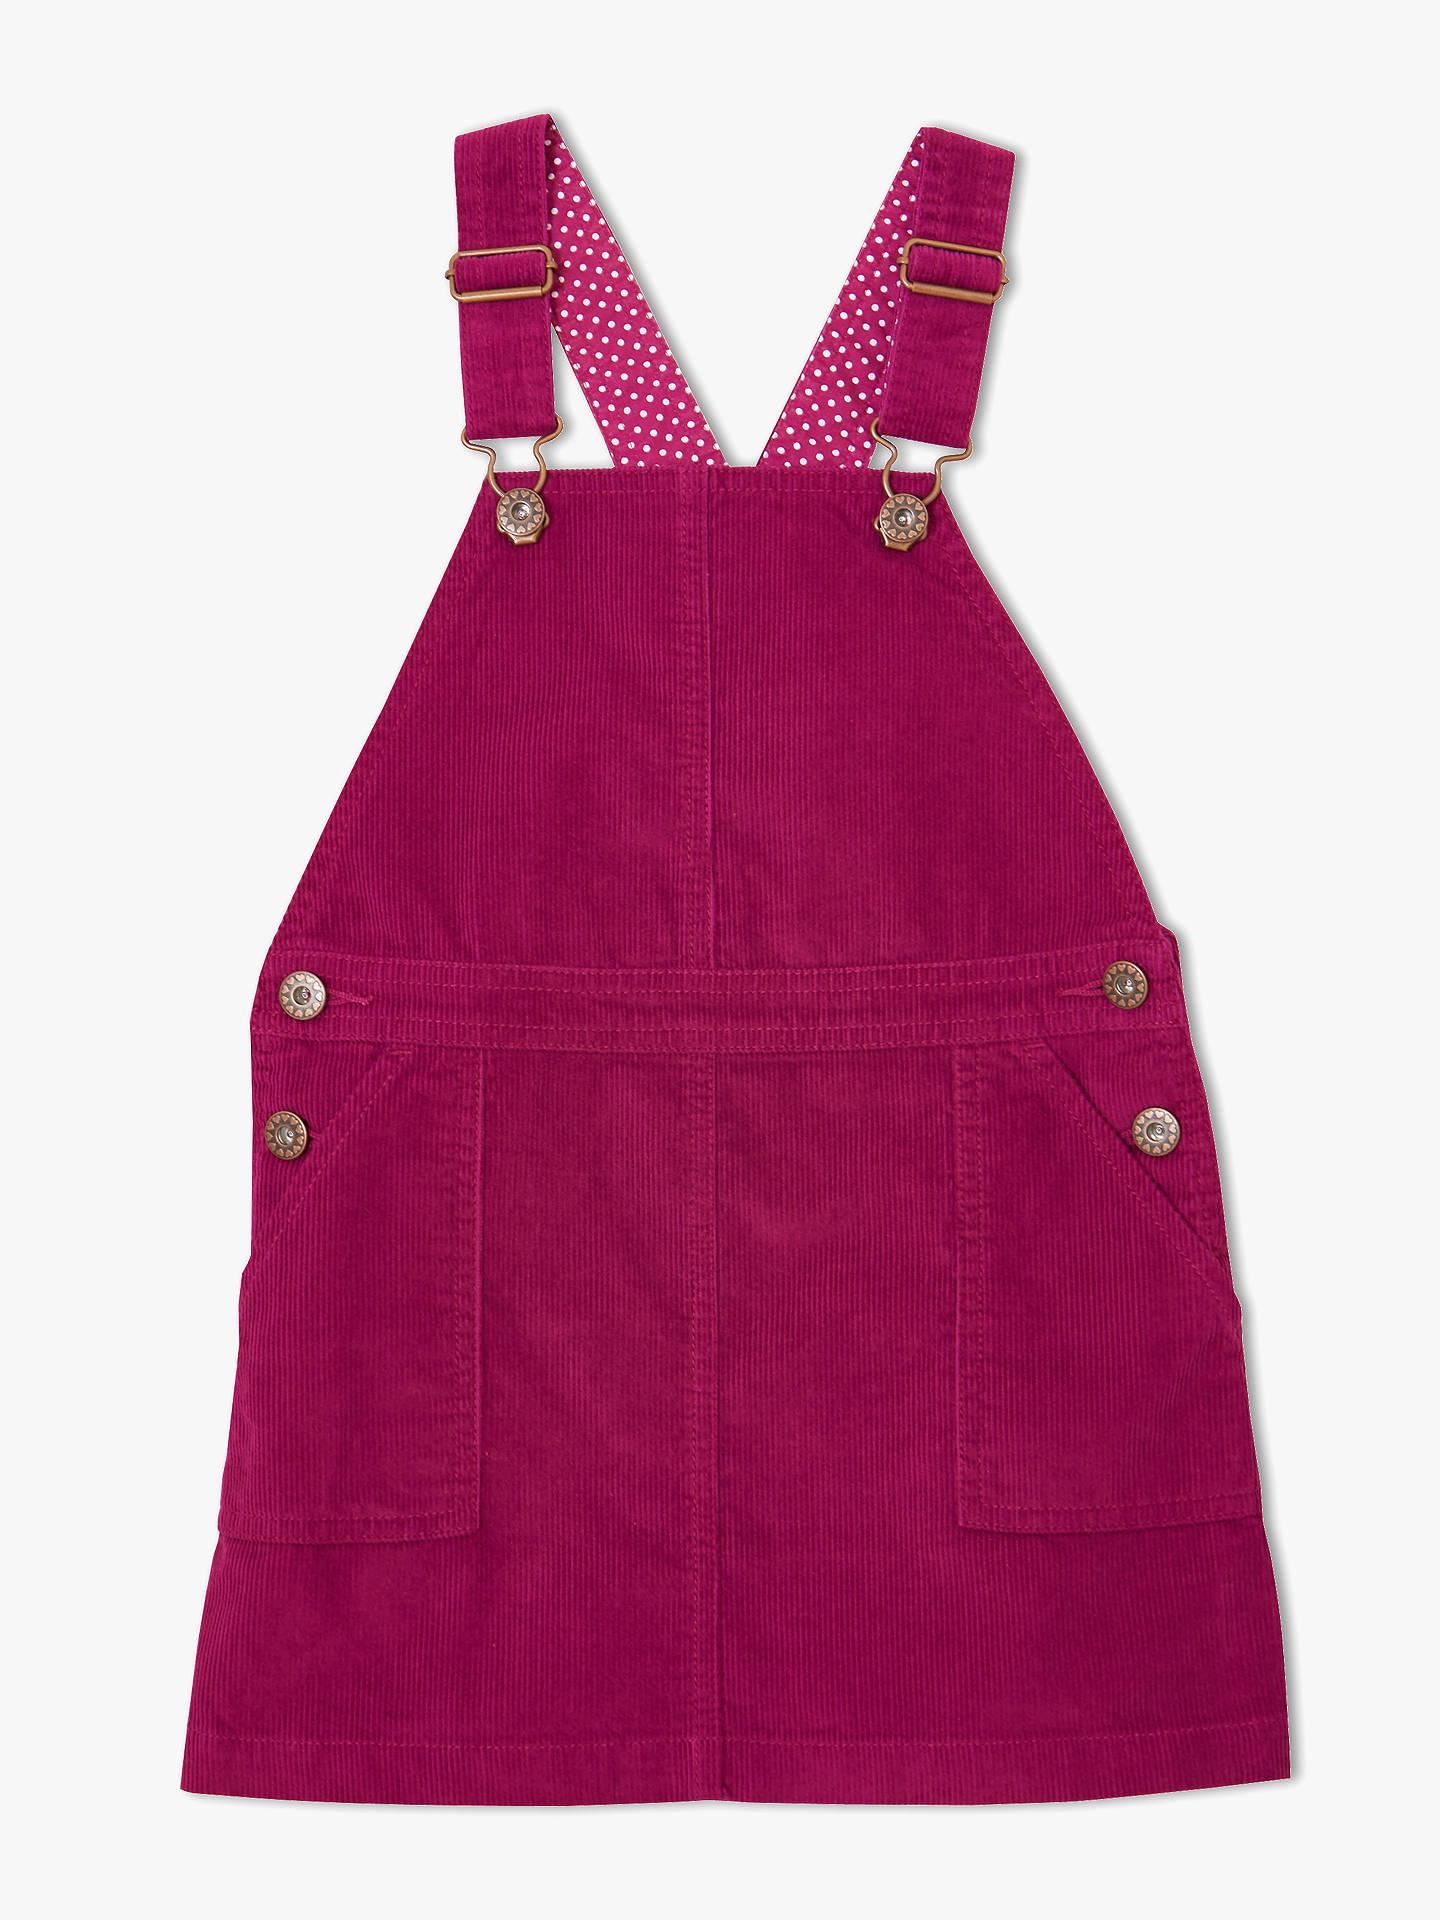 9e62174f8b46 Buy John Lewis & Partners Girls' Corduroy Pinafore Dress, Berry, 2 years  Online ...